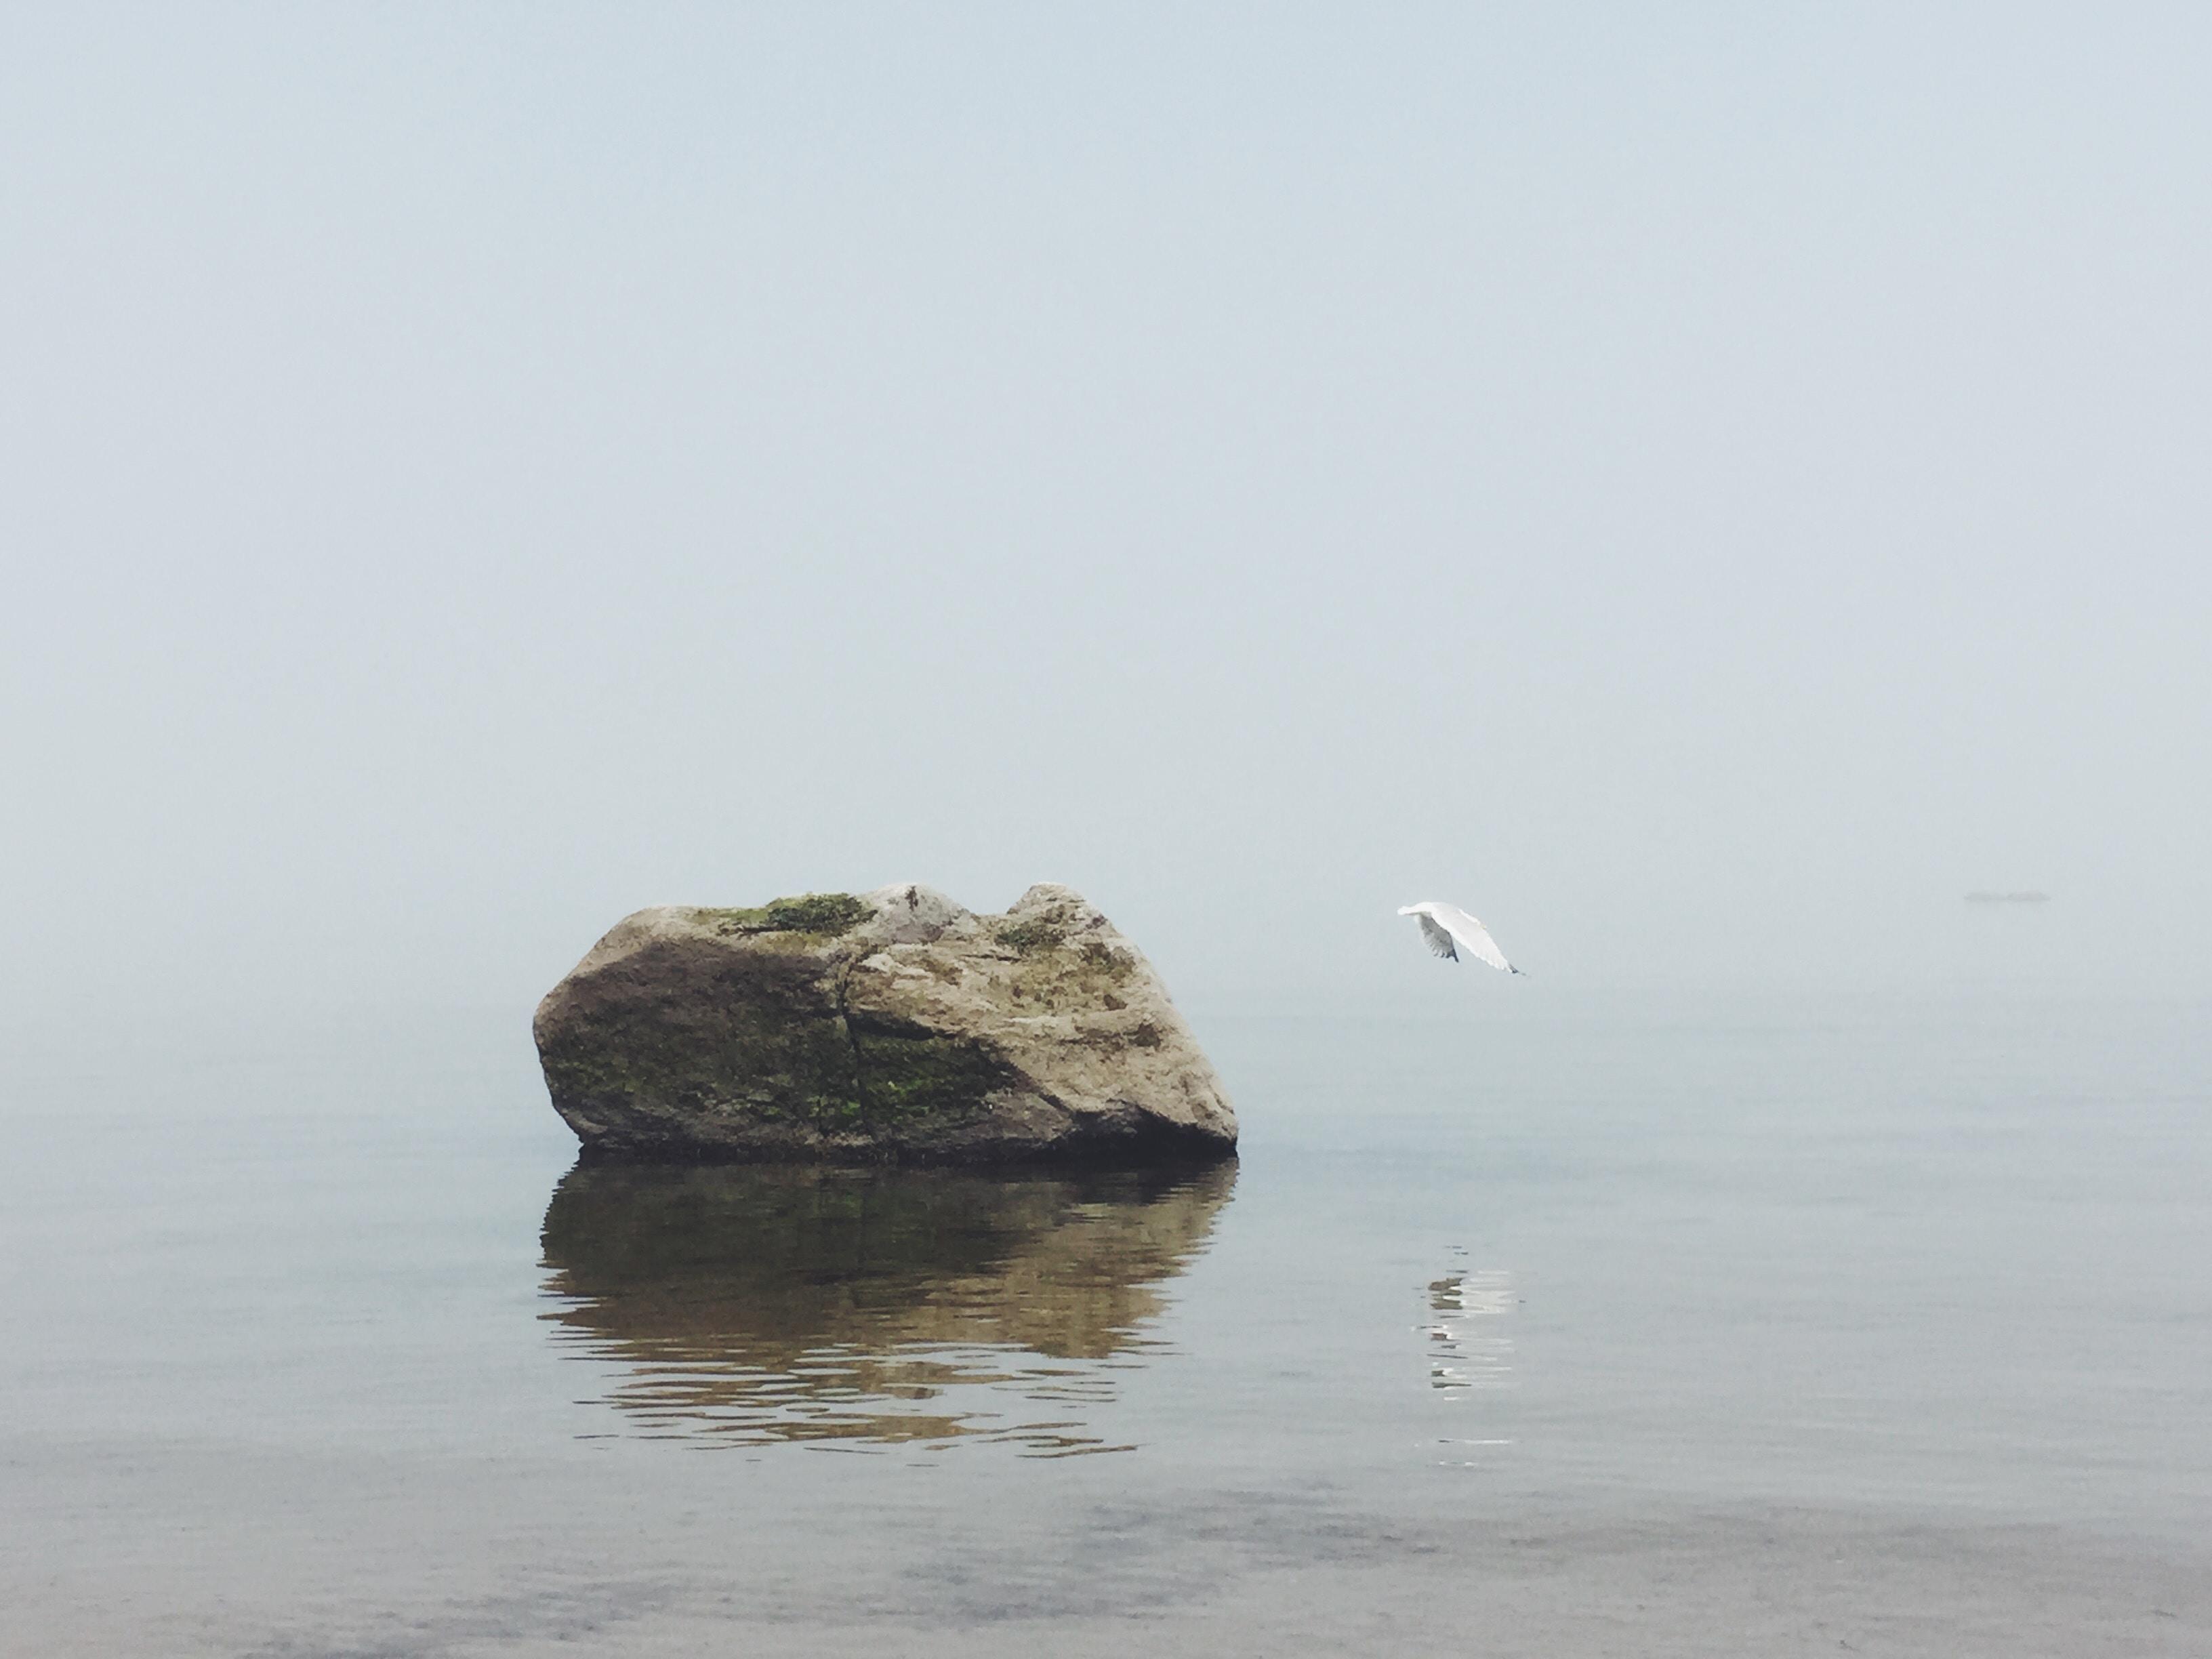 Seagull flies off of lone boulder on a foggy seashore